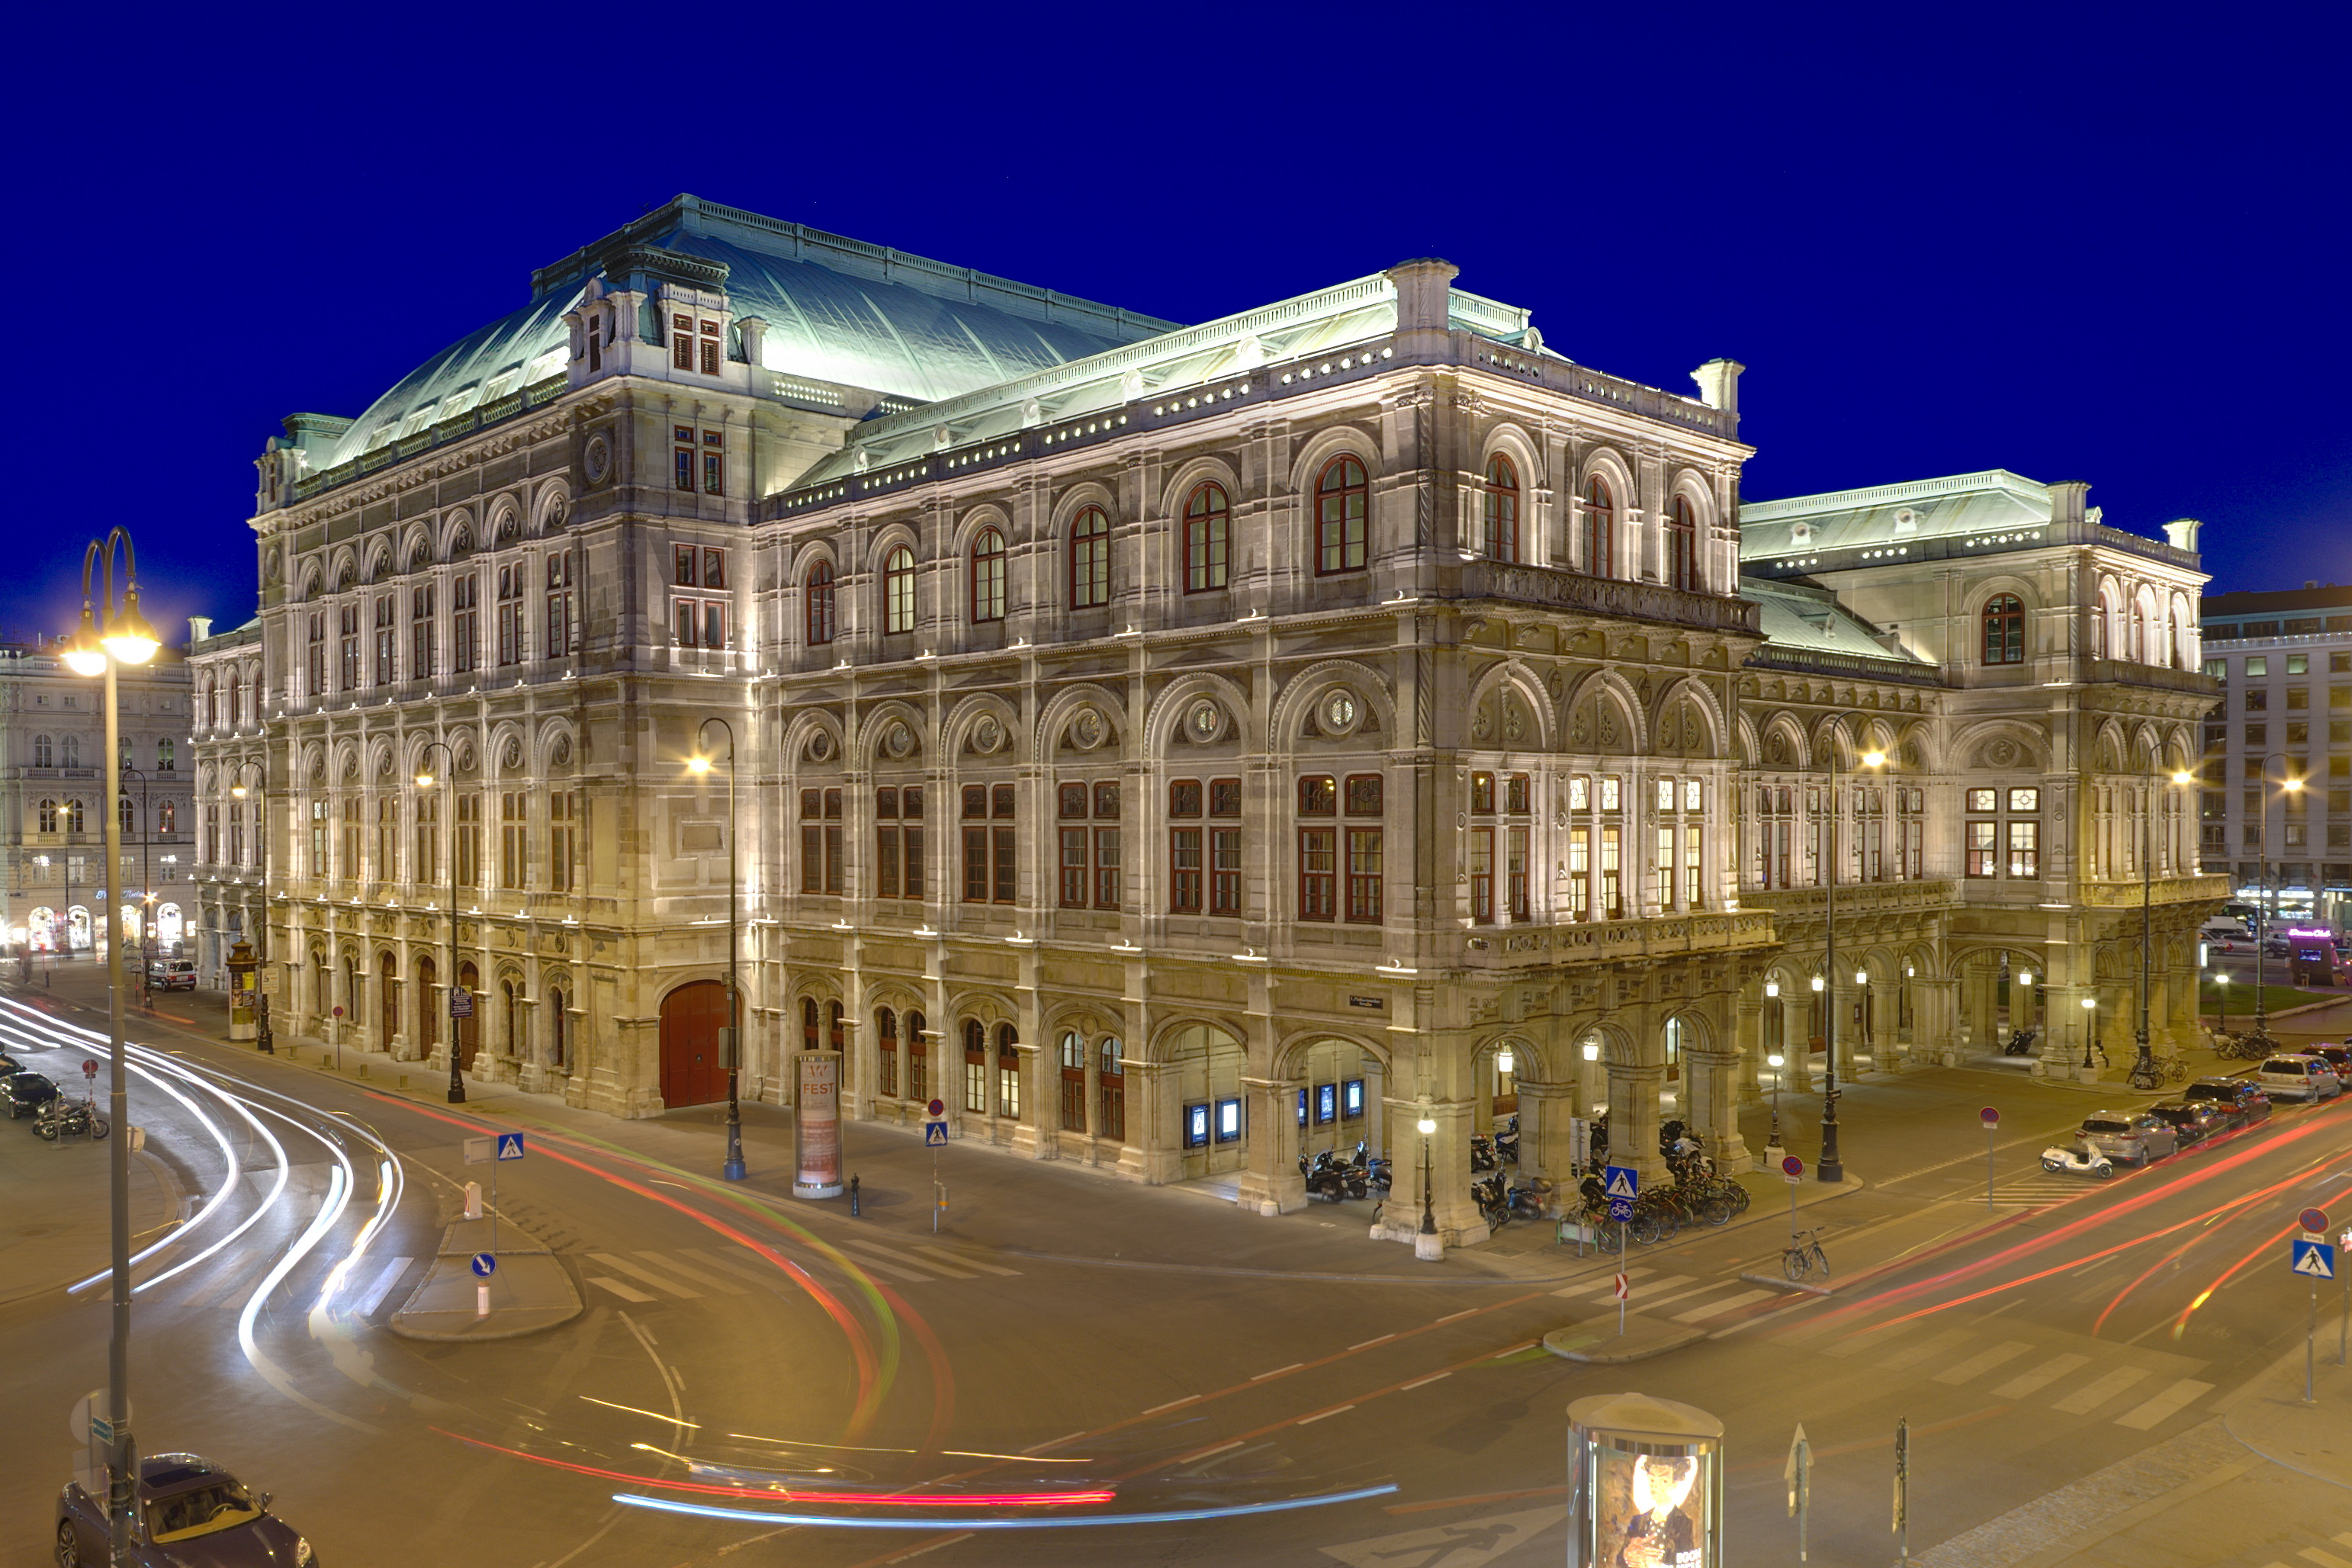 File:State Opera House Vienna, Austria.jpg - Wikimedia Commons